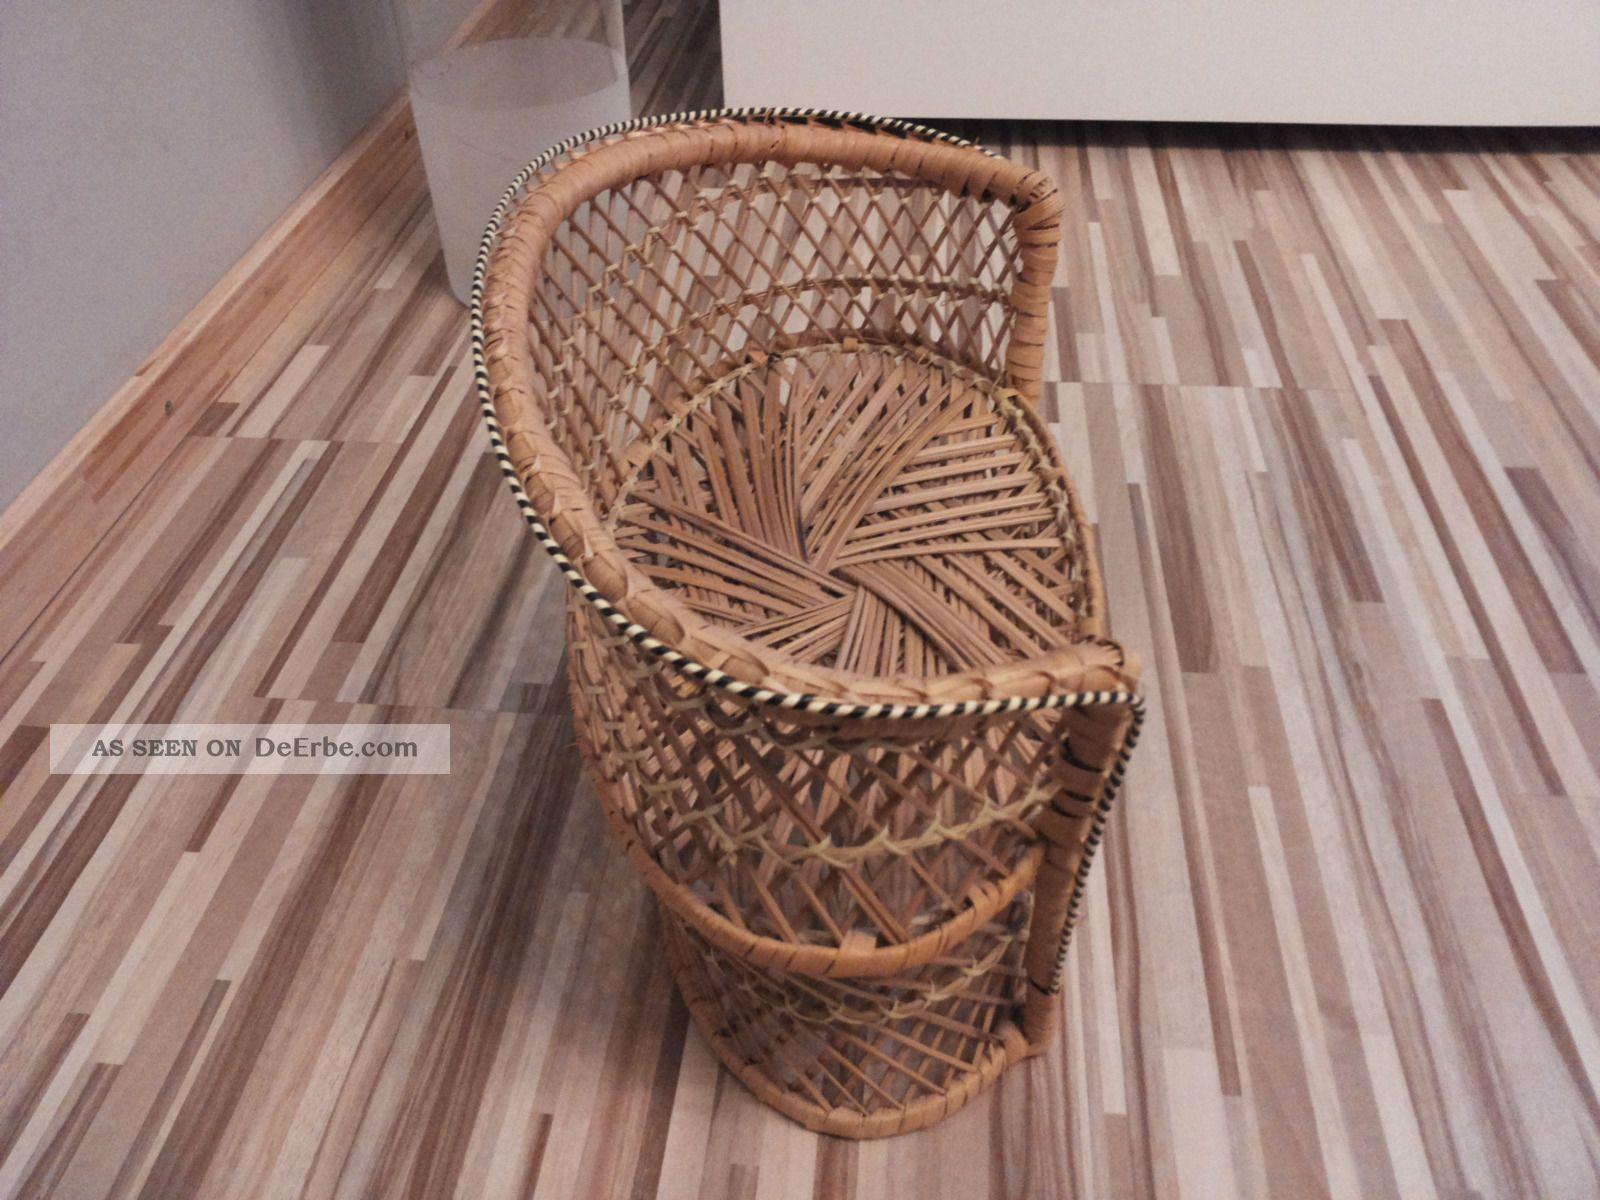 puppen bank korbsessel rattan. Black Bedroom Furniture Sets. Home Design Ideas